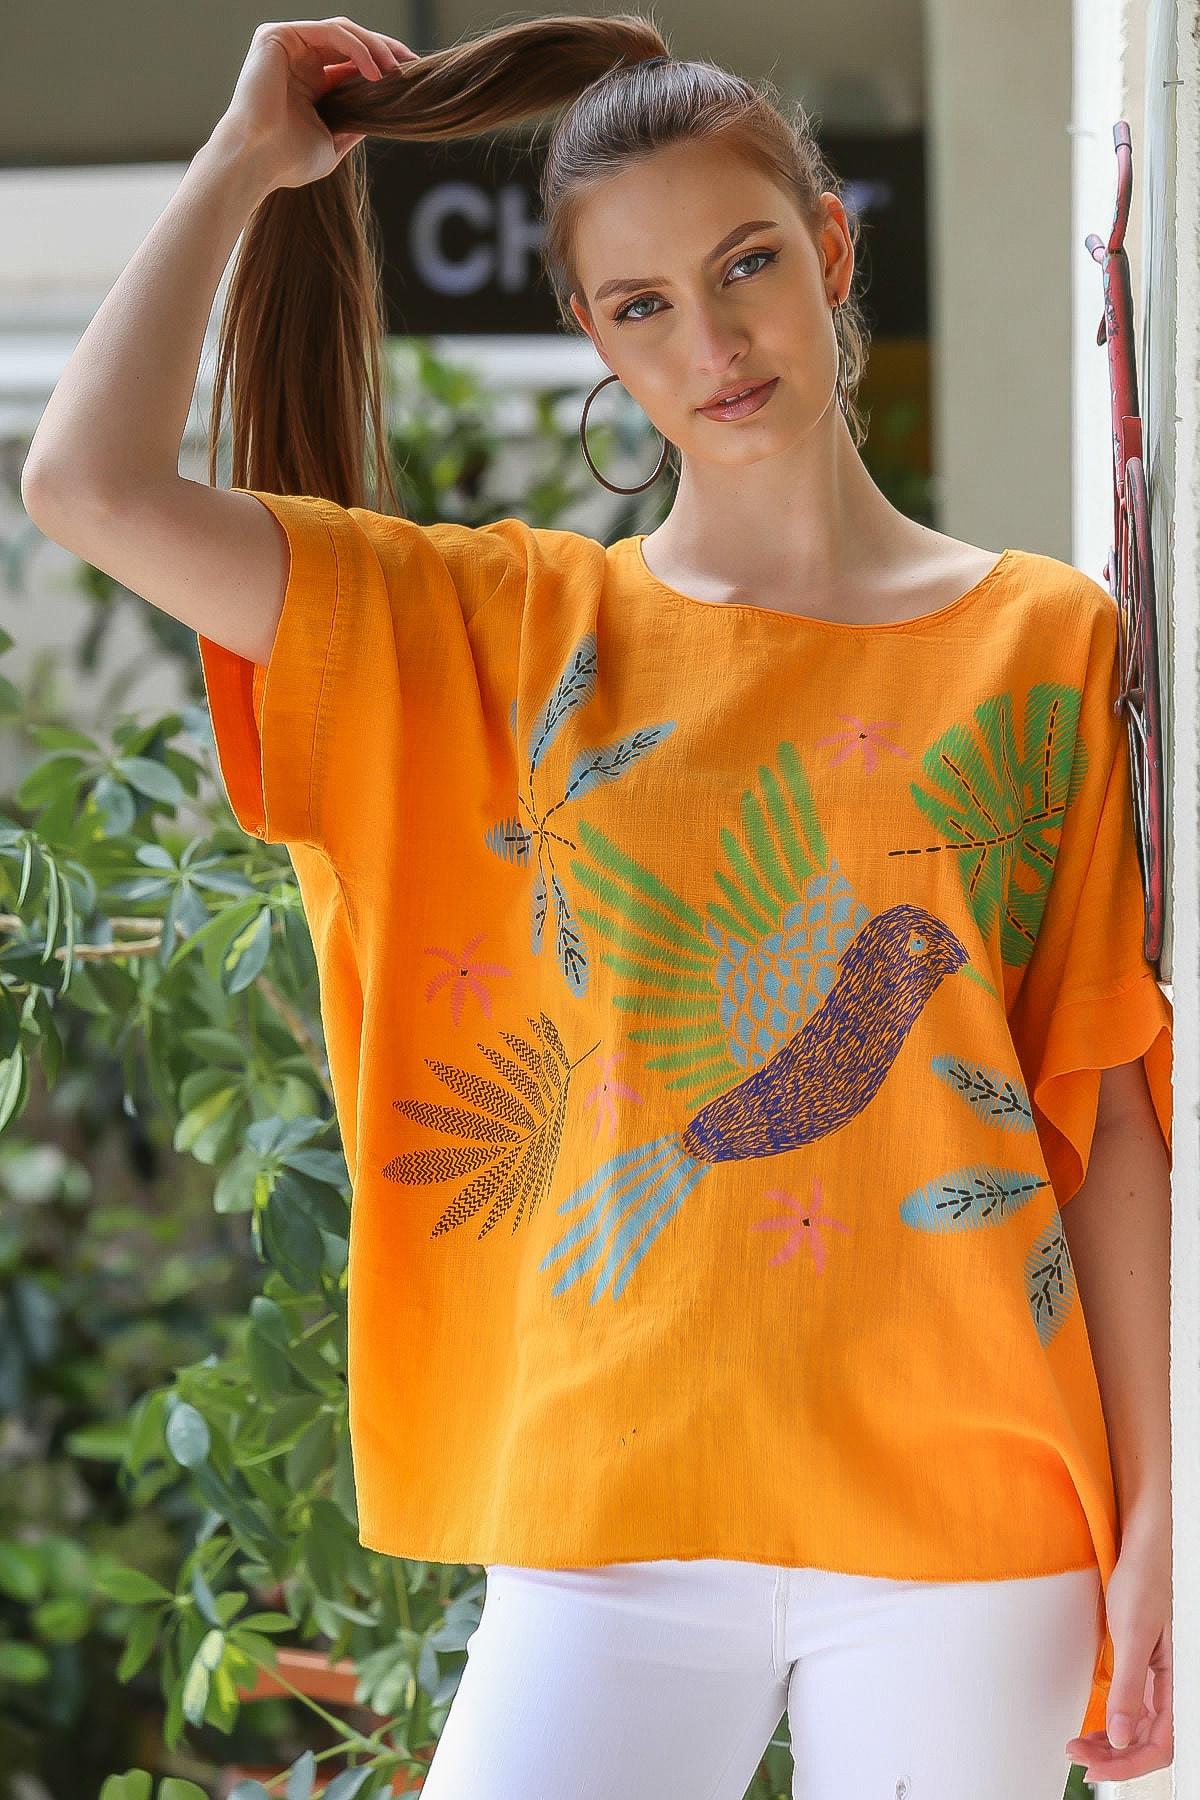 Chiccy Kadın Turuncu  Sıfır Yaka Yalı Çapkını Kuş Desenli Salaş Dokuma Bluz M10010200BL95418 0